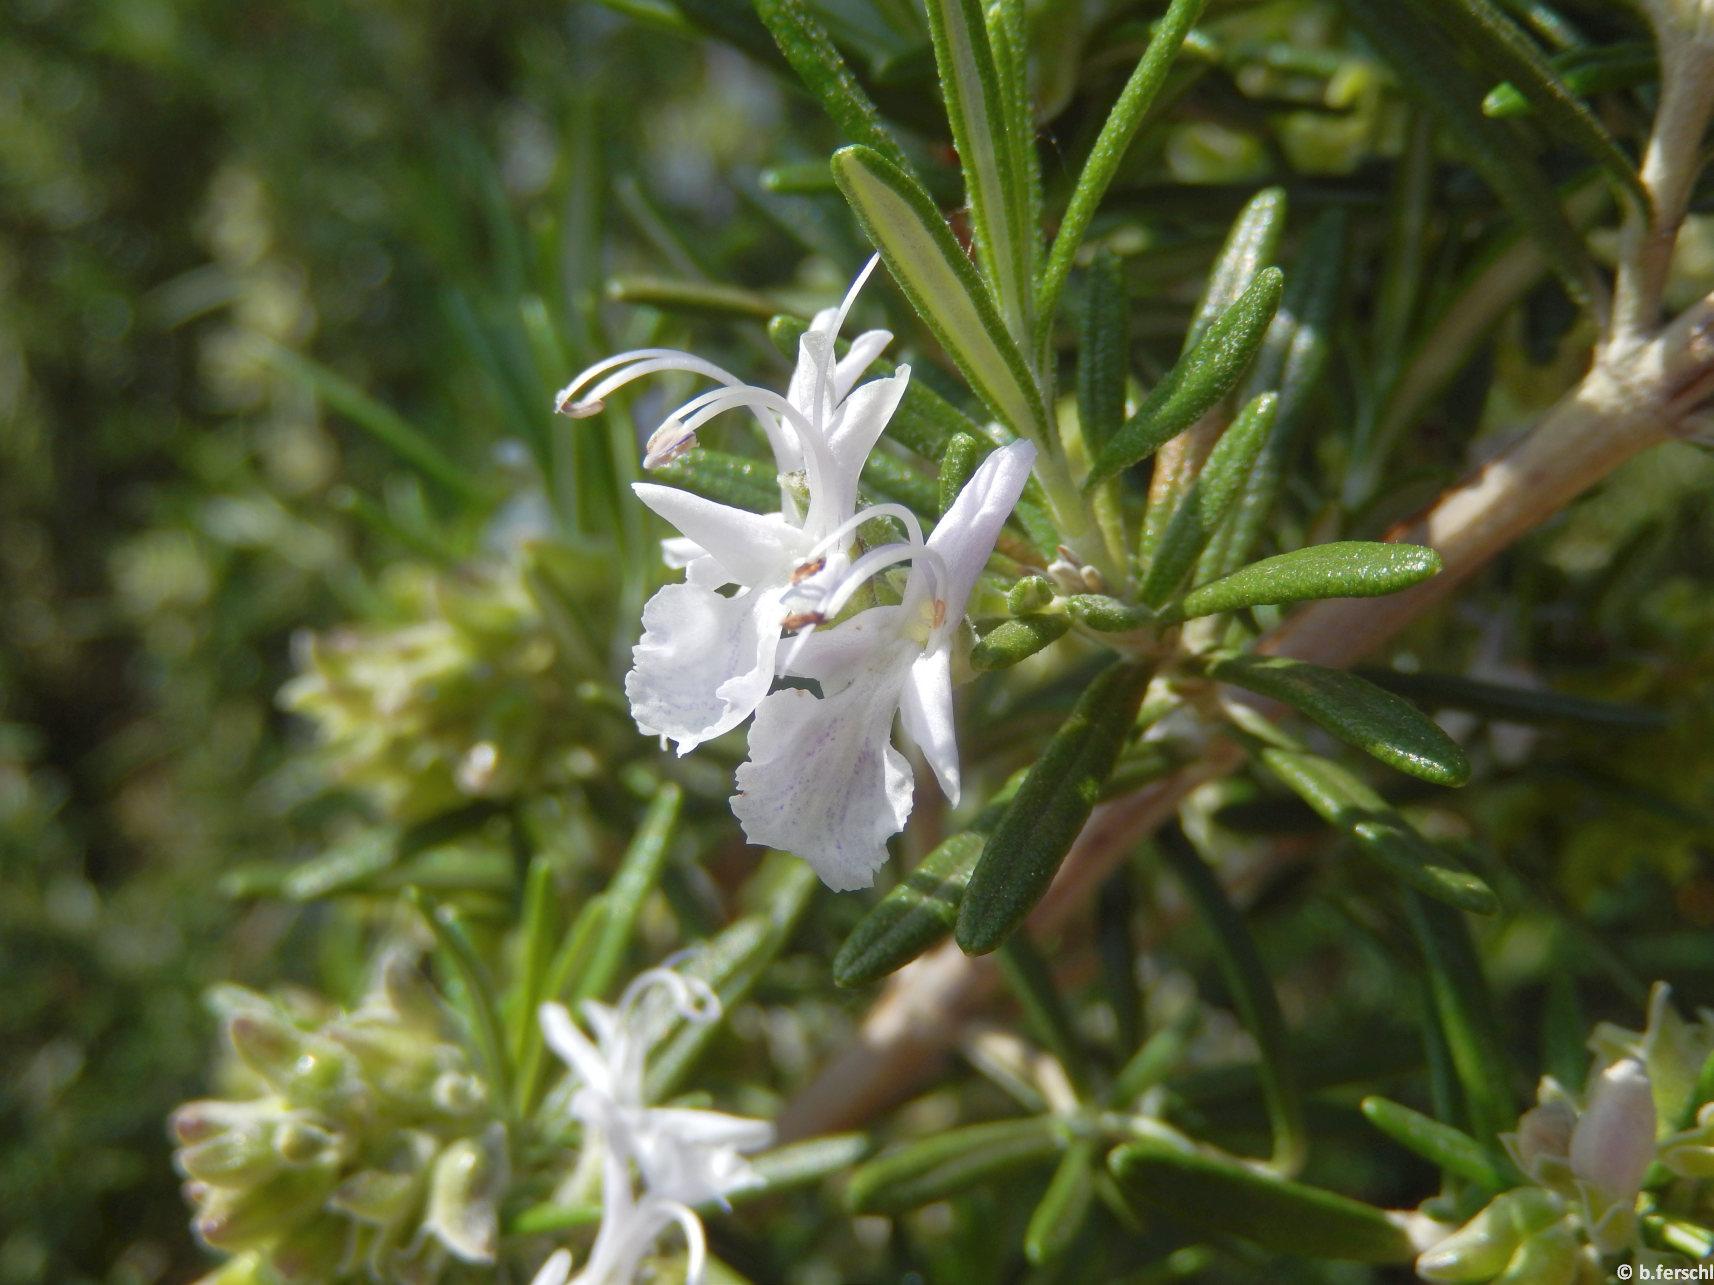 Rosmarinus officinalis ajakos virágai